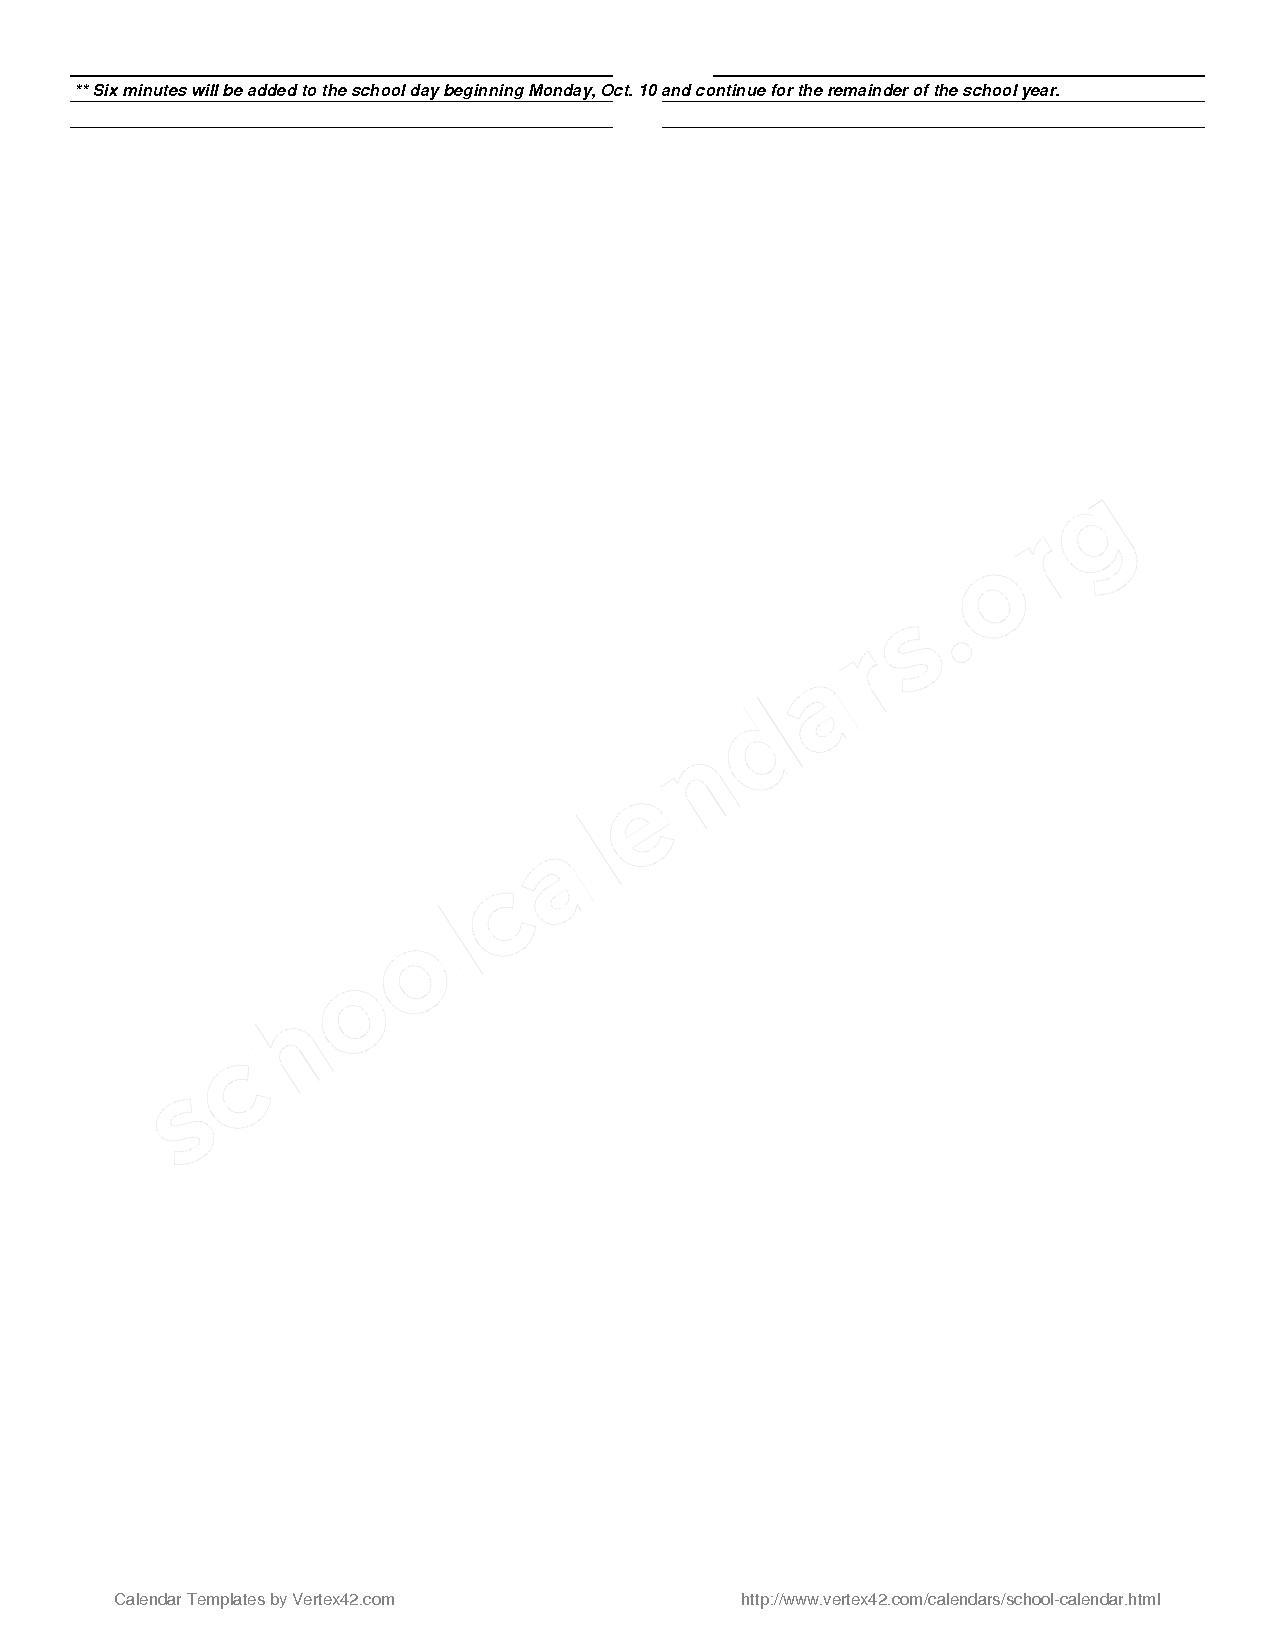 2016 - 2017 School Calendar – Martha Vinyard Elementary School – page 2